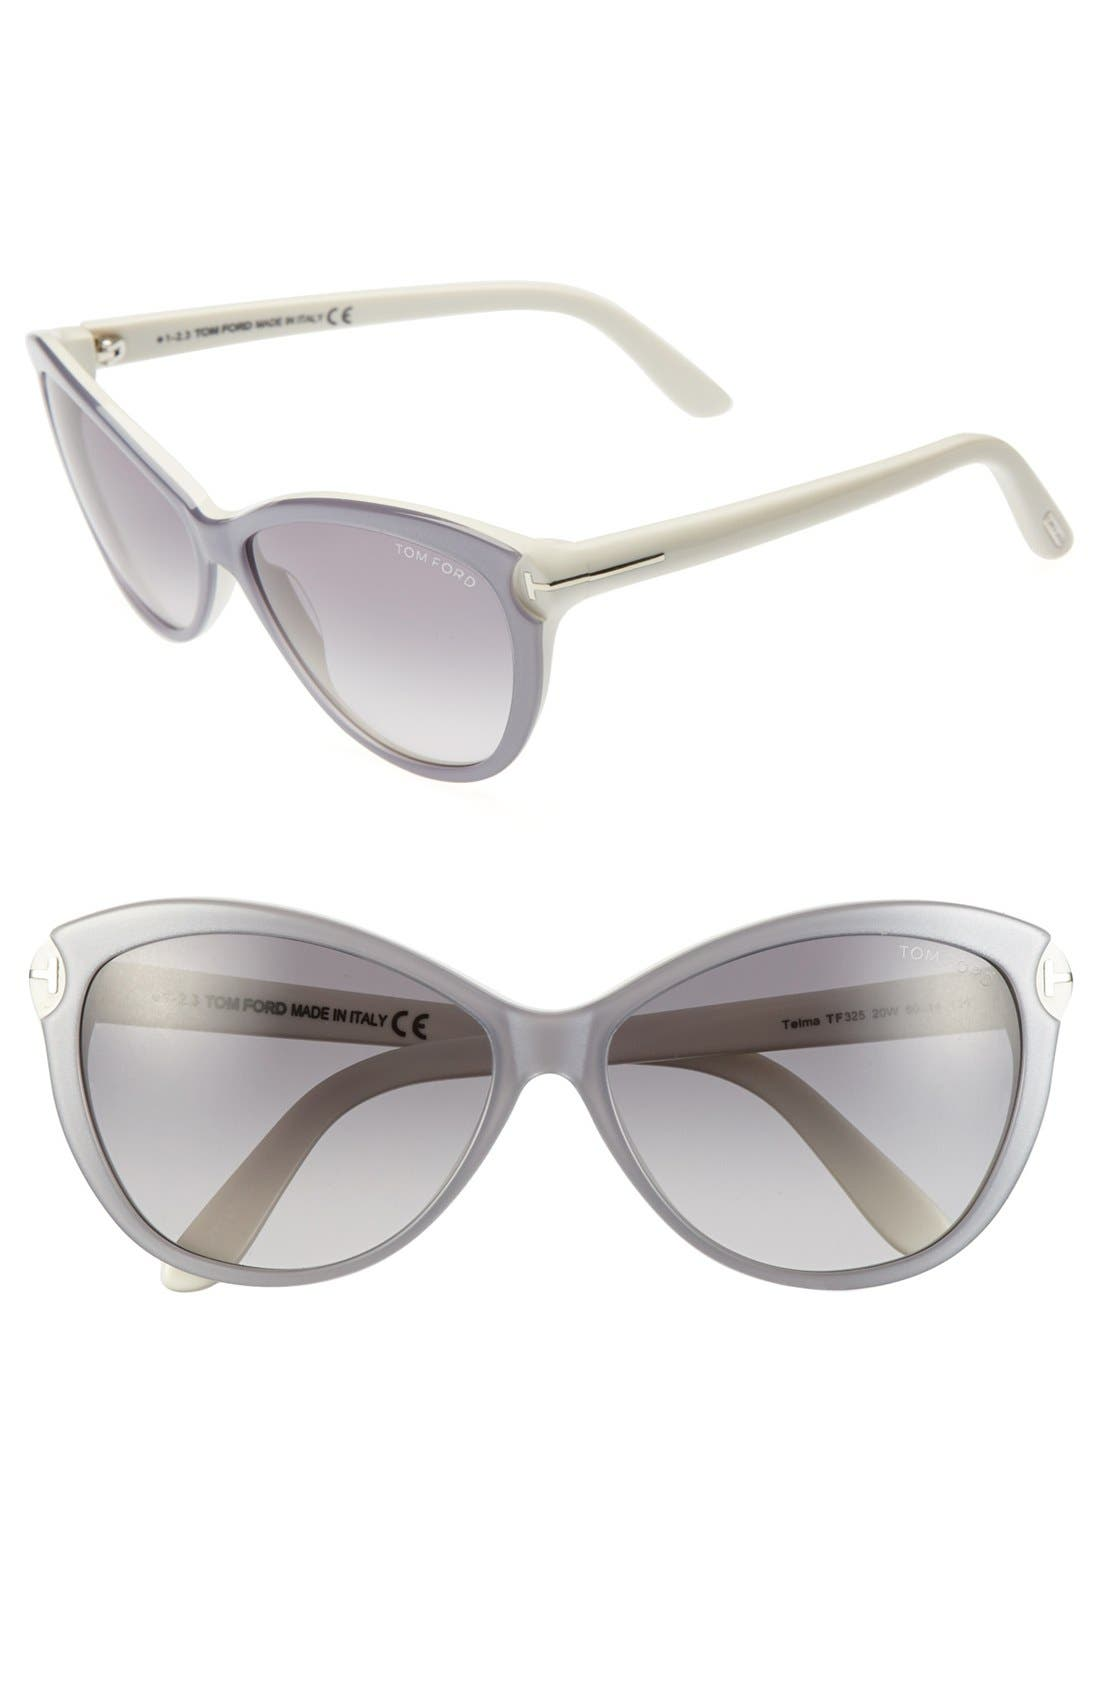 Main Image - Tom Ford 'Telma' 60mm Cat Eye Sunglasses